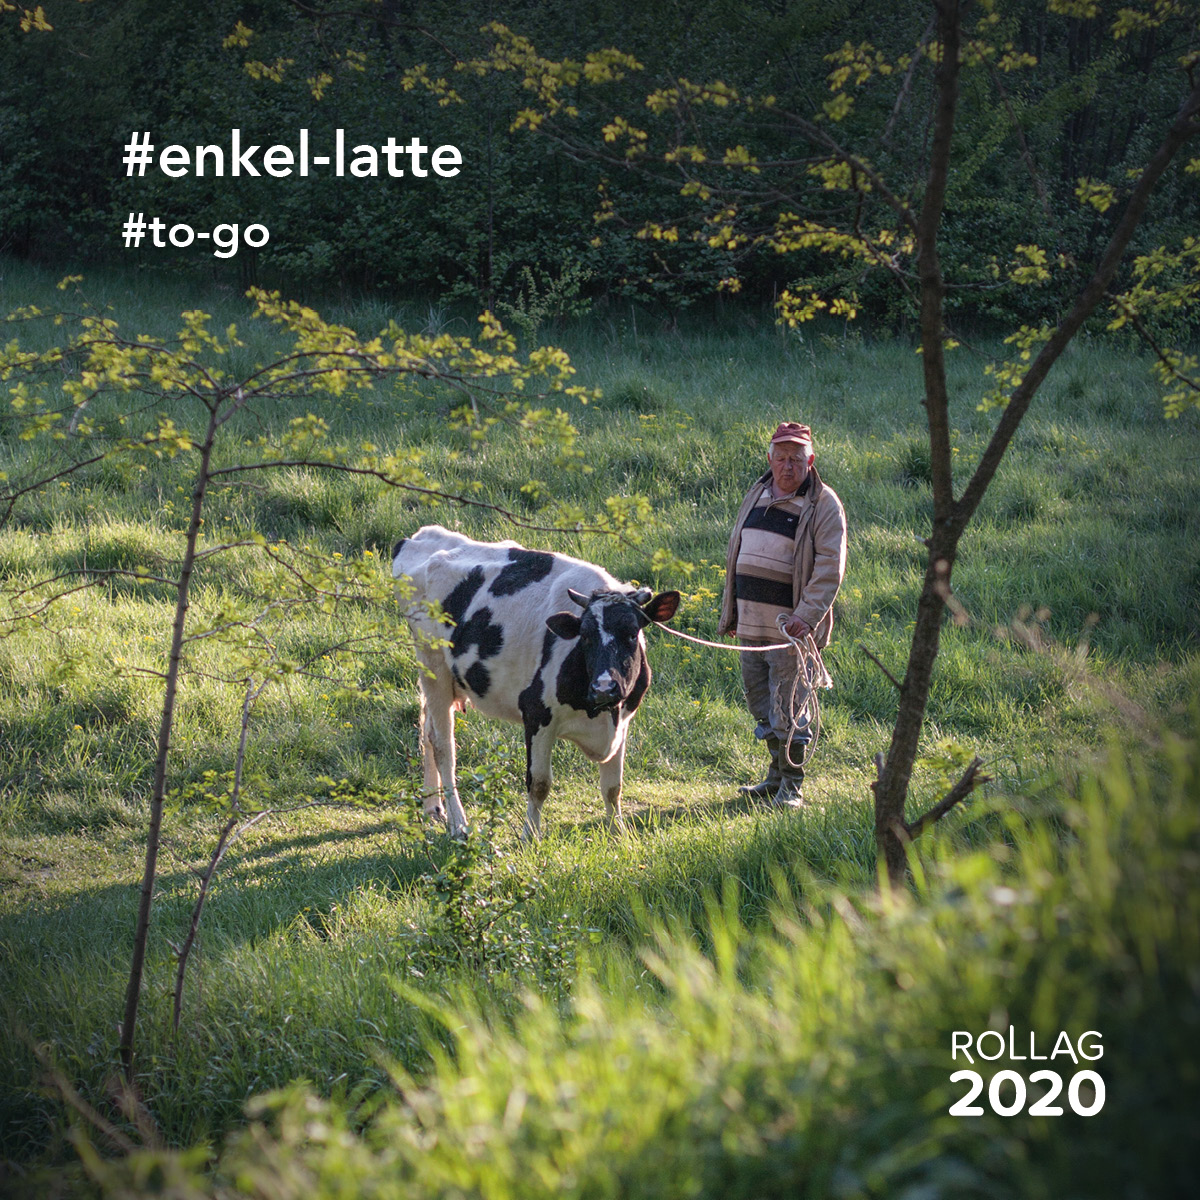 Rollag 2020